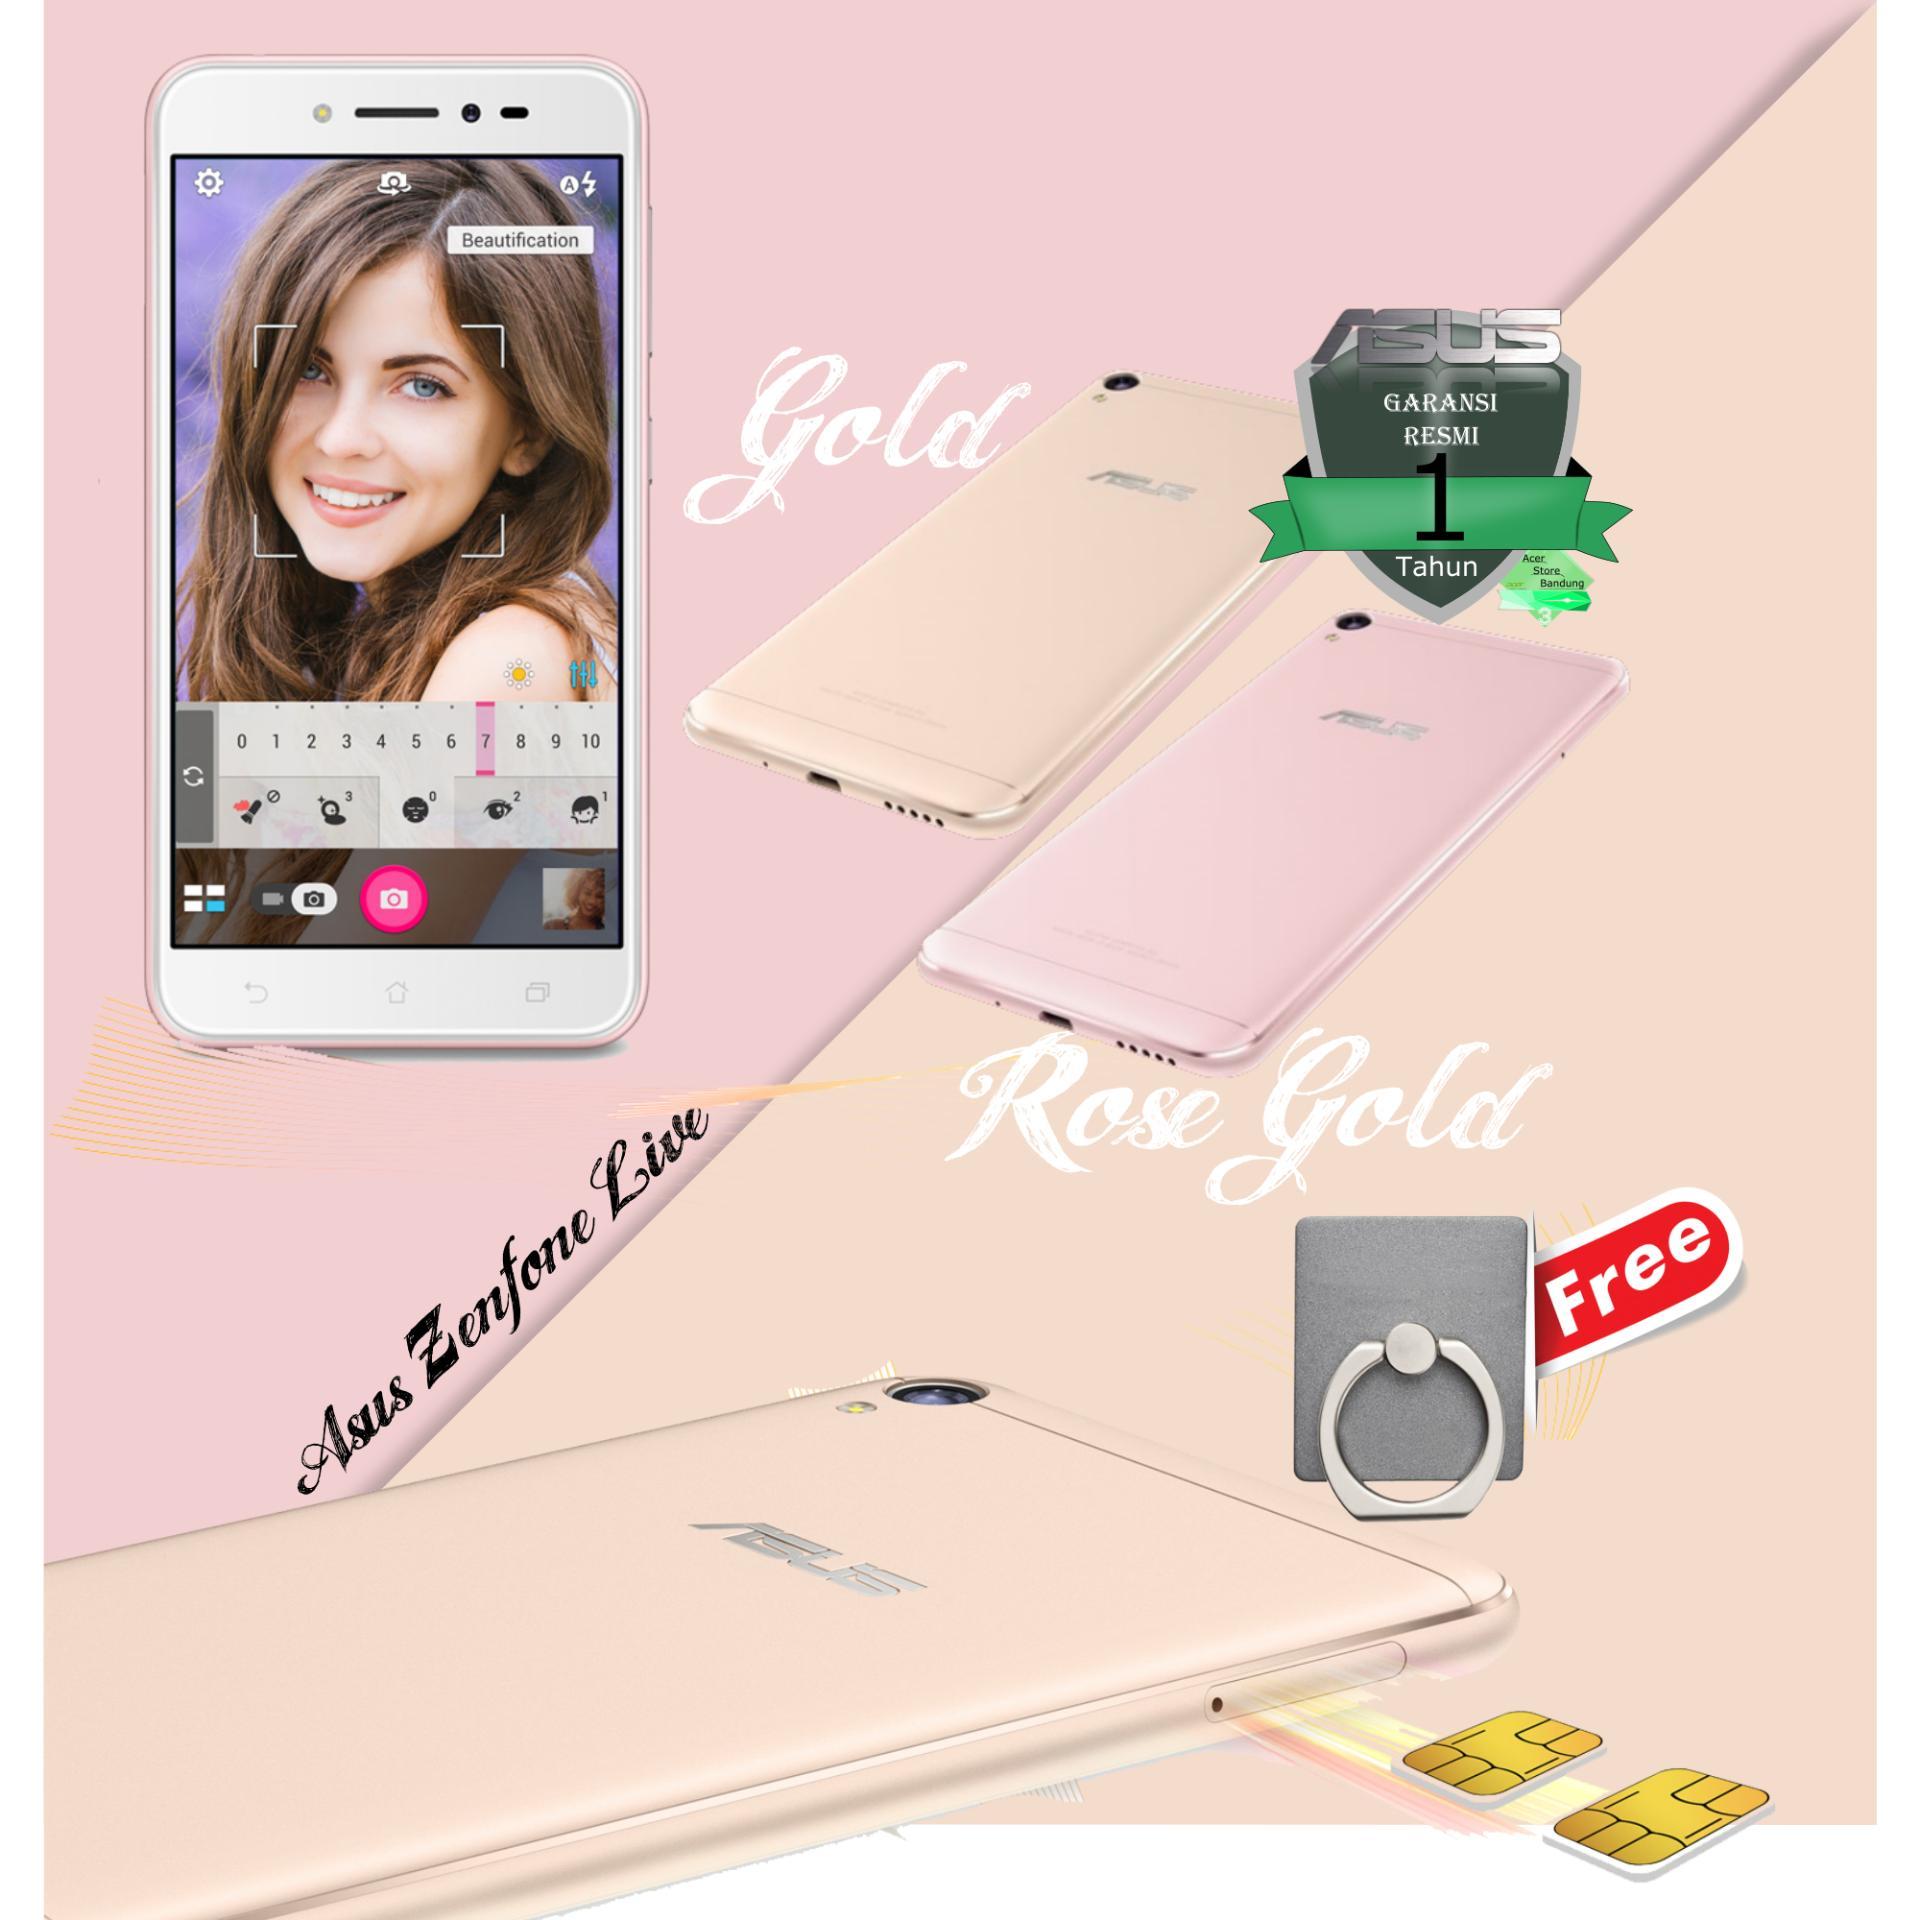 Hot Deals Asus Zenfone Live Zb501kl 2 16gb Free Ring Holder 3 Max Zc520tl Grey Garansi Resmi 1 Tahun Indonesia